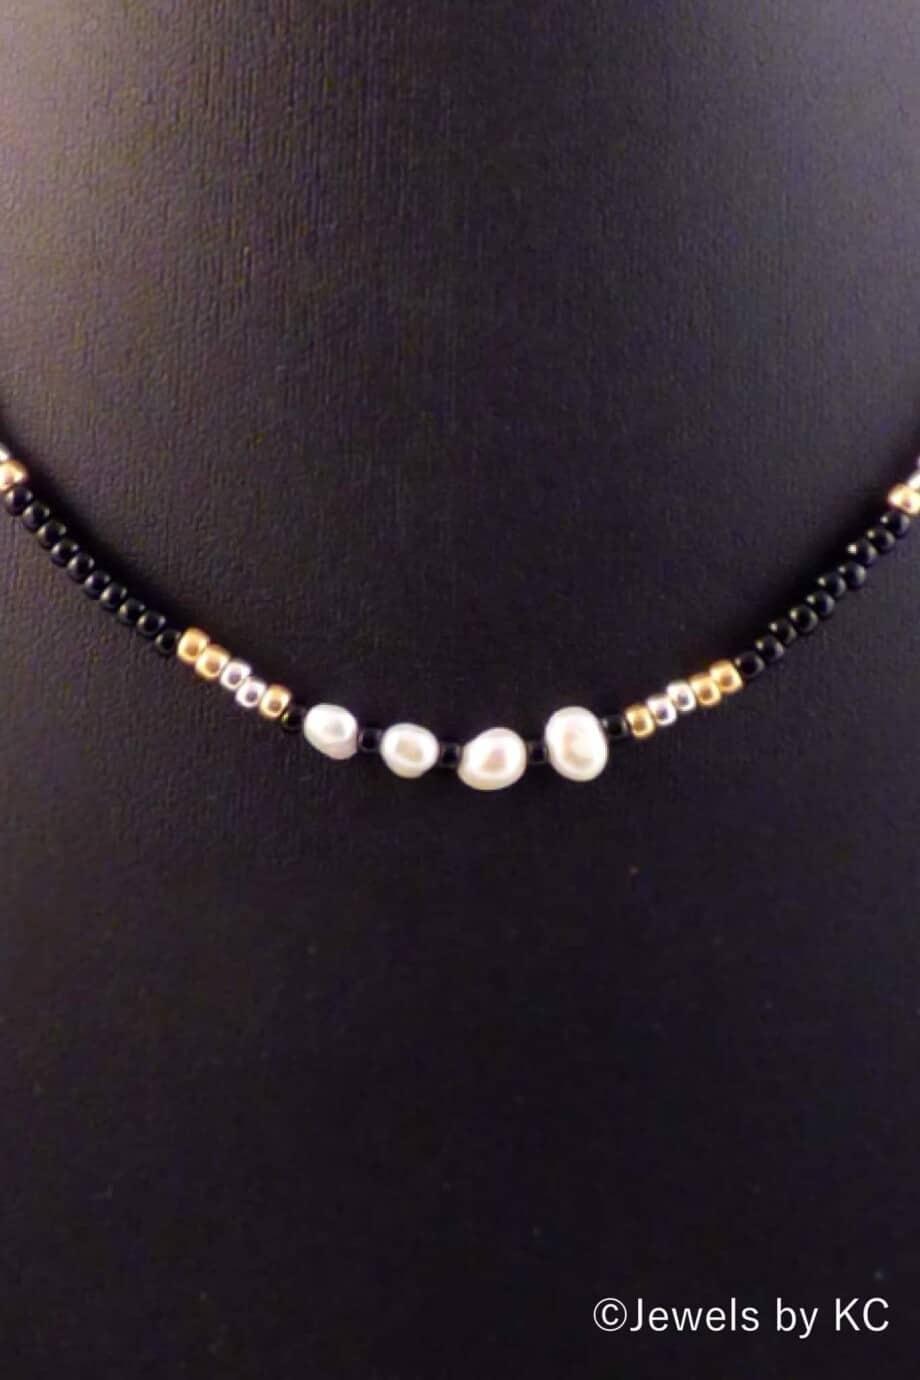 Miyuki Rocailles ketting 'Royal' zwart-goud-zilver-parels